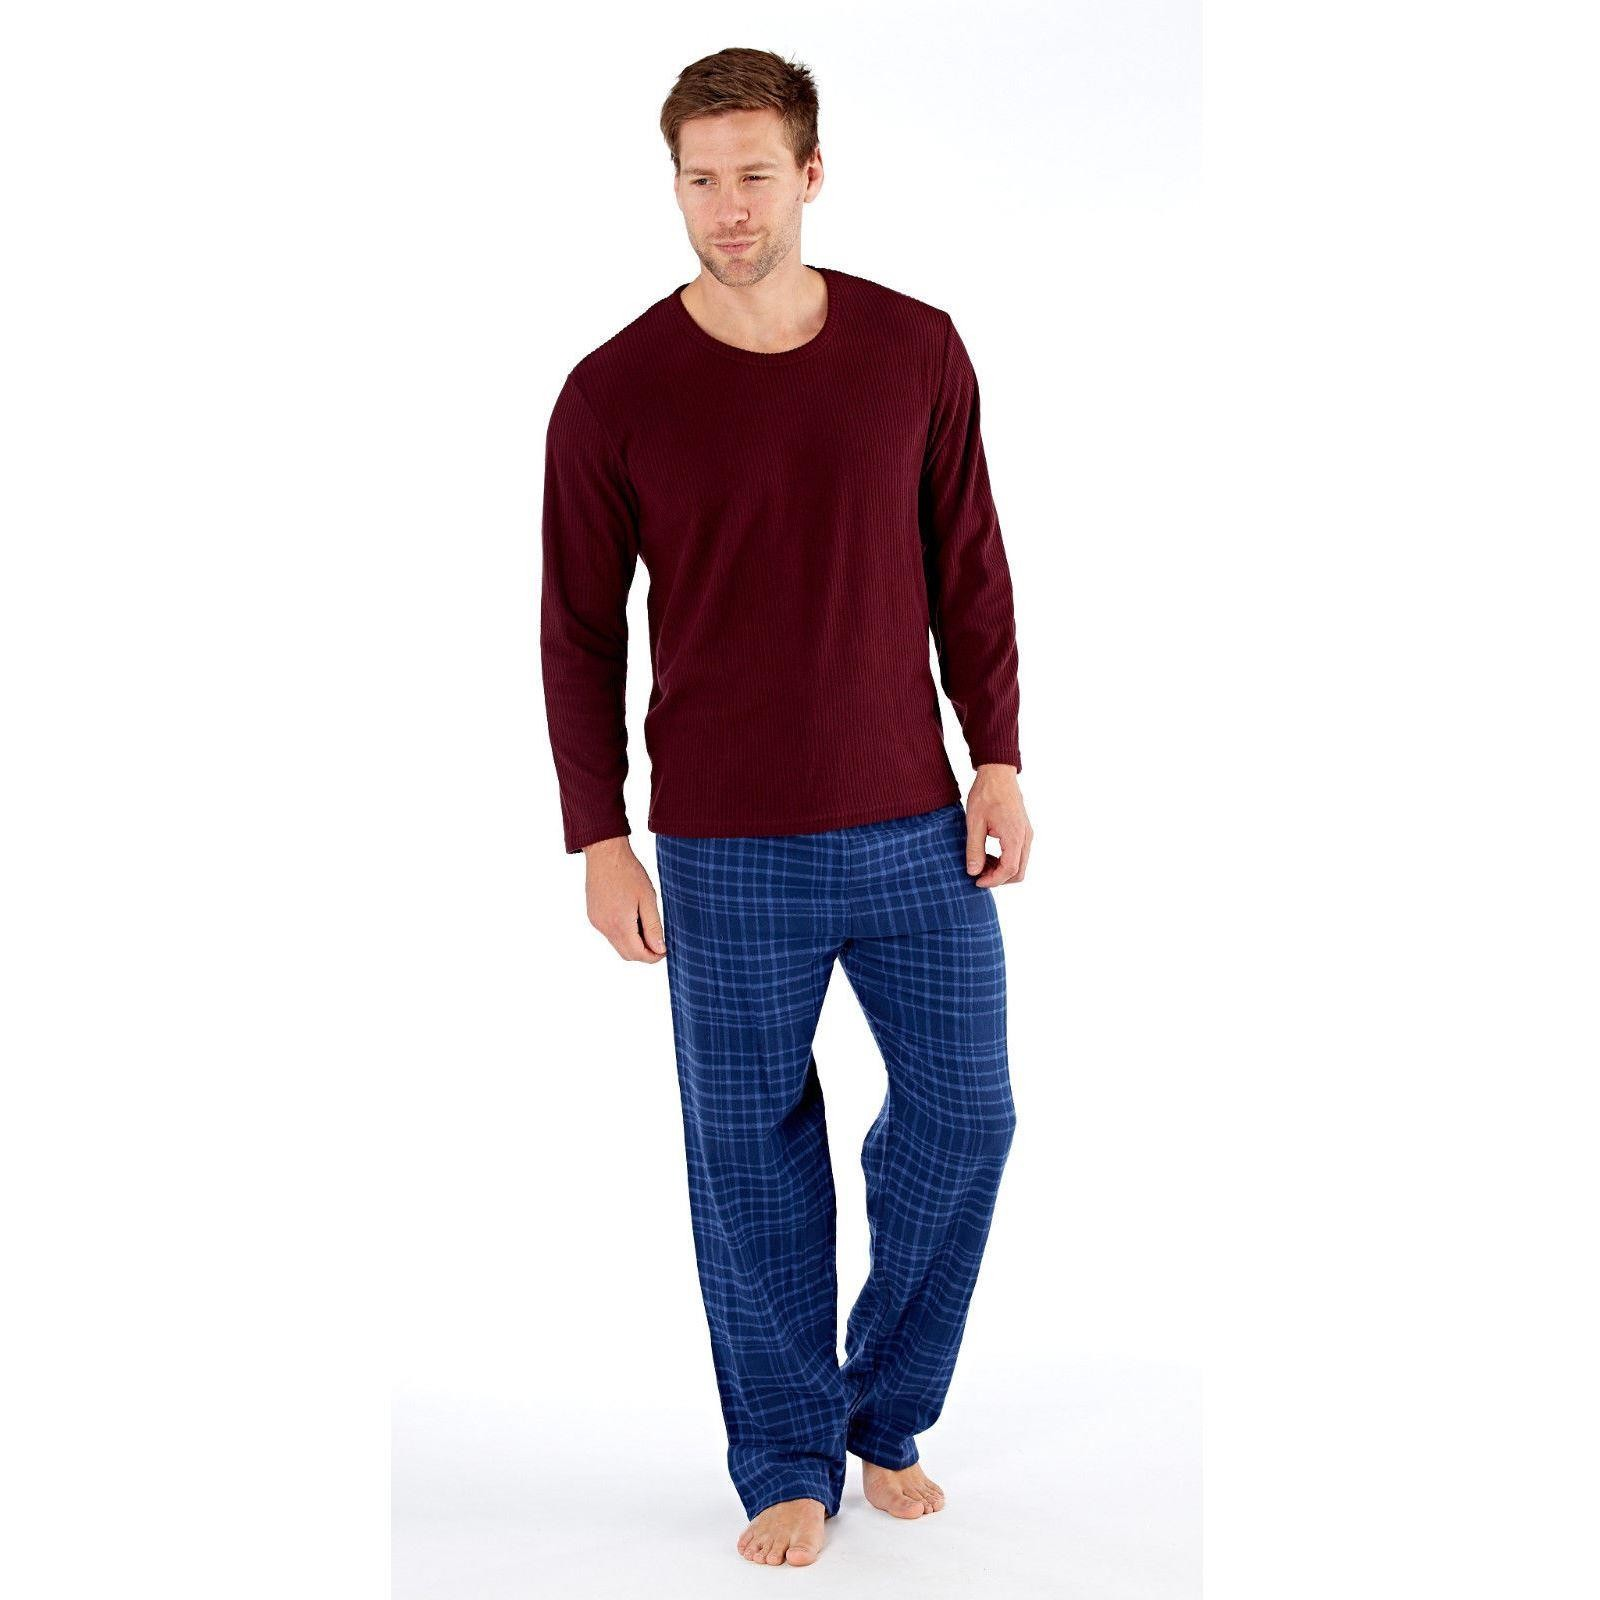 Harvey James Mens Fleece/Flannel Pyjamas - Burgundy/Petrol